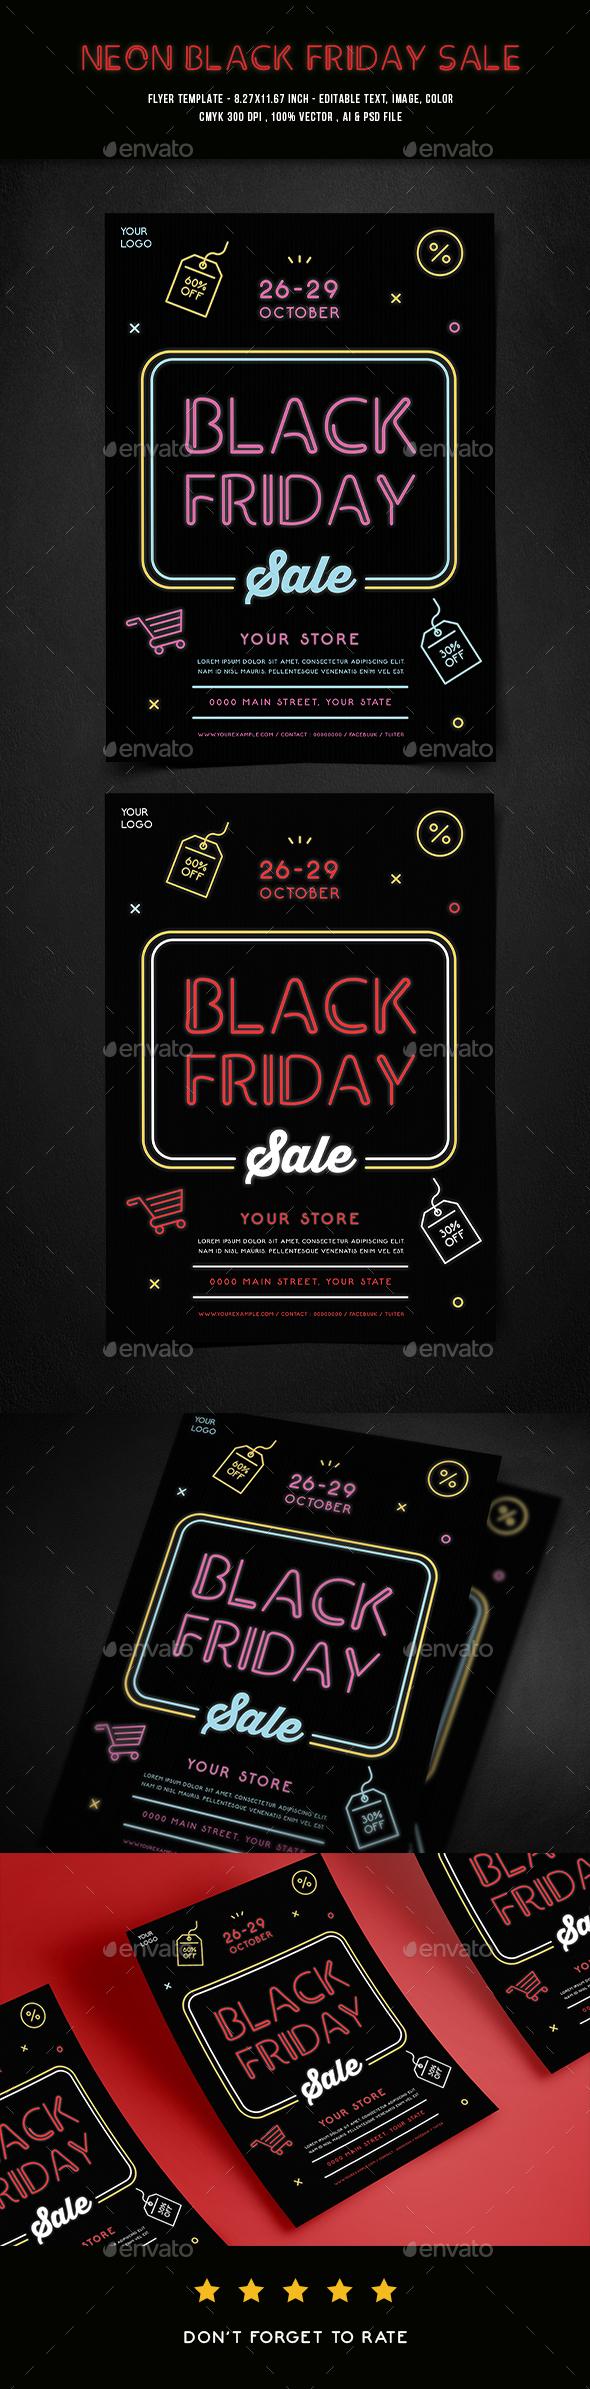 GraphicRiver Black Friday Sale Flyer 20826437